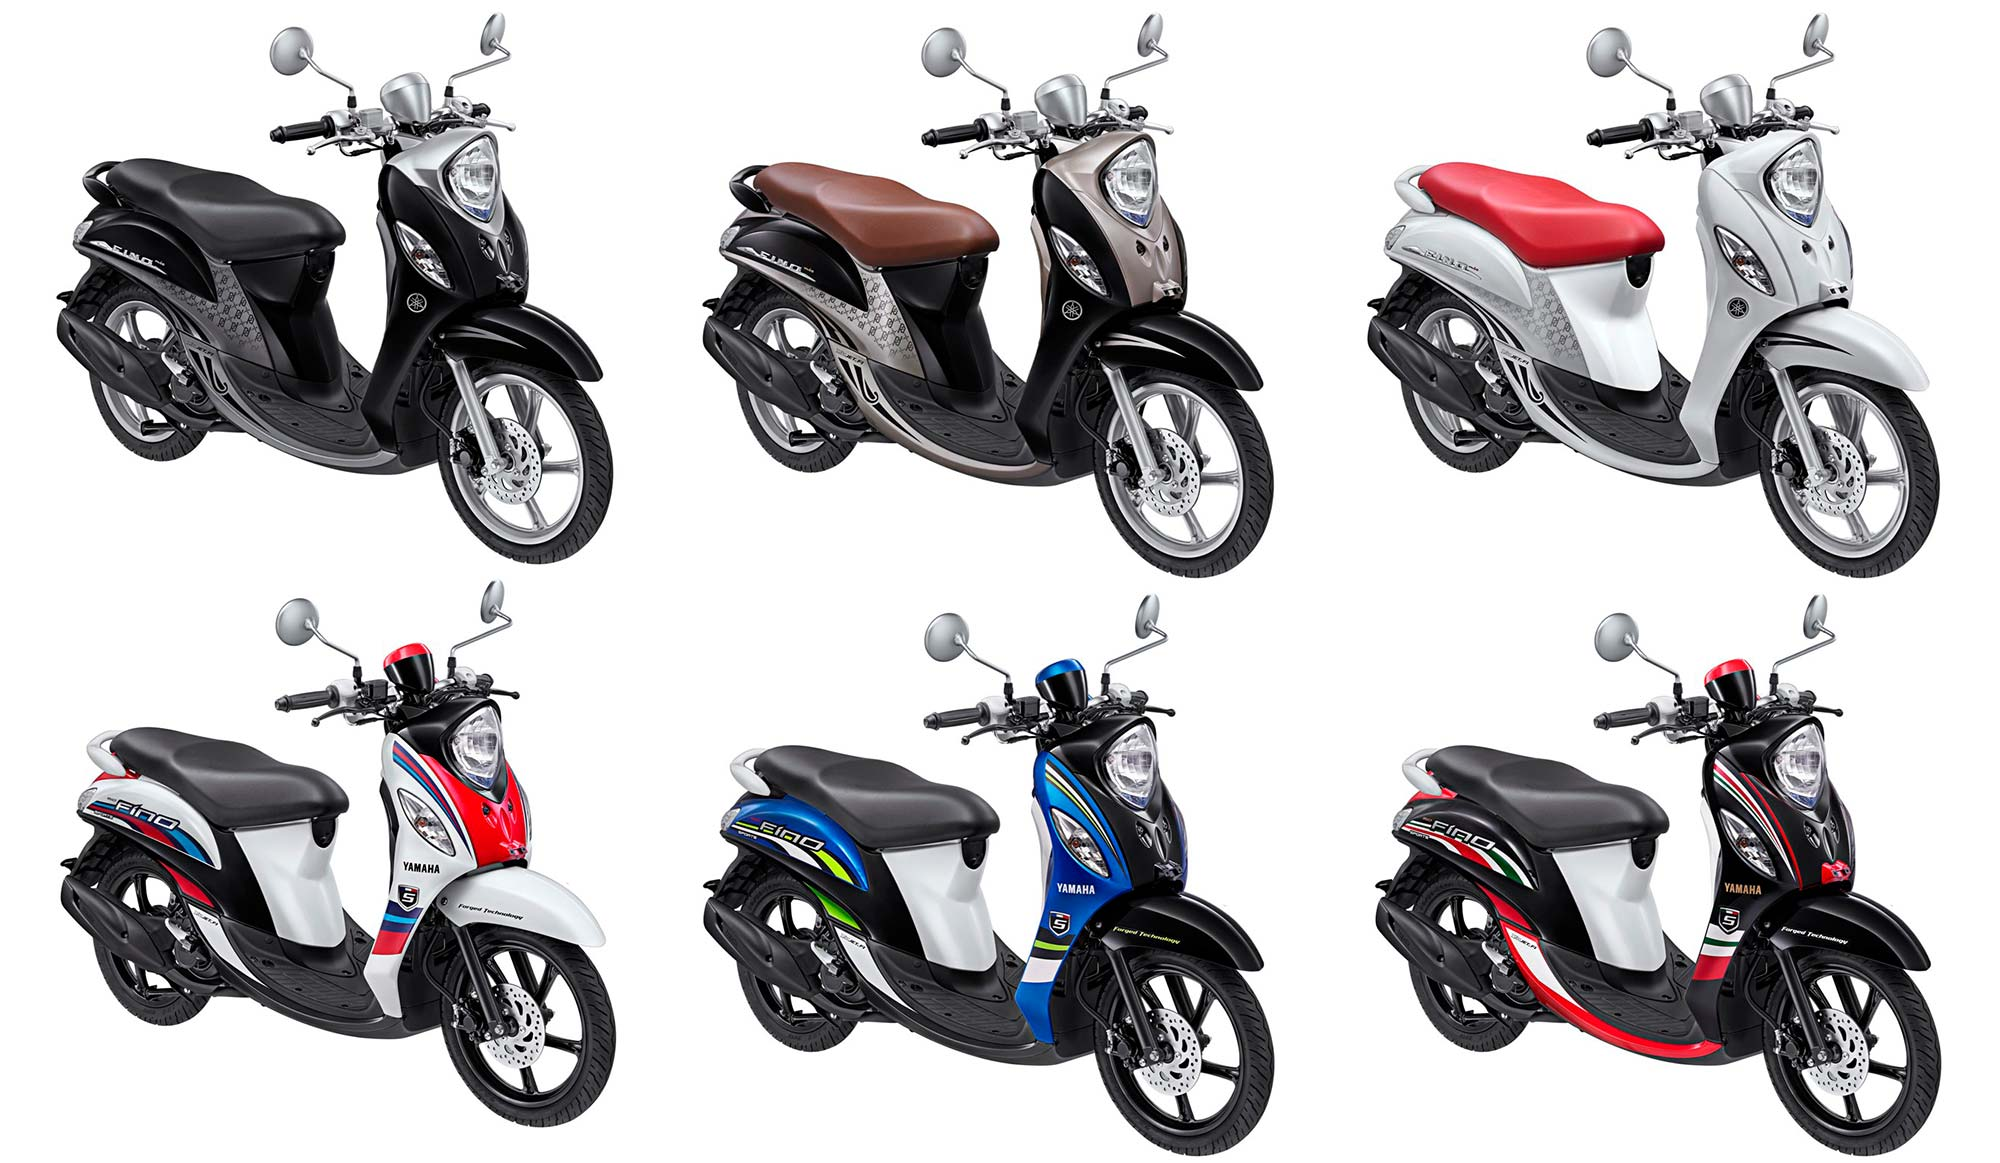 Koleksi 97 Gambar Motor Yamaha Fino Sporty Terbaru Terkeren Klaras